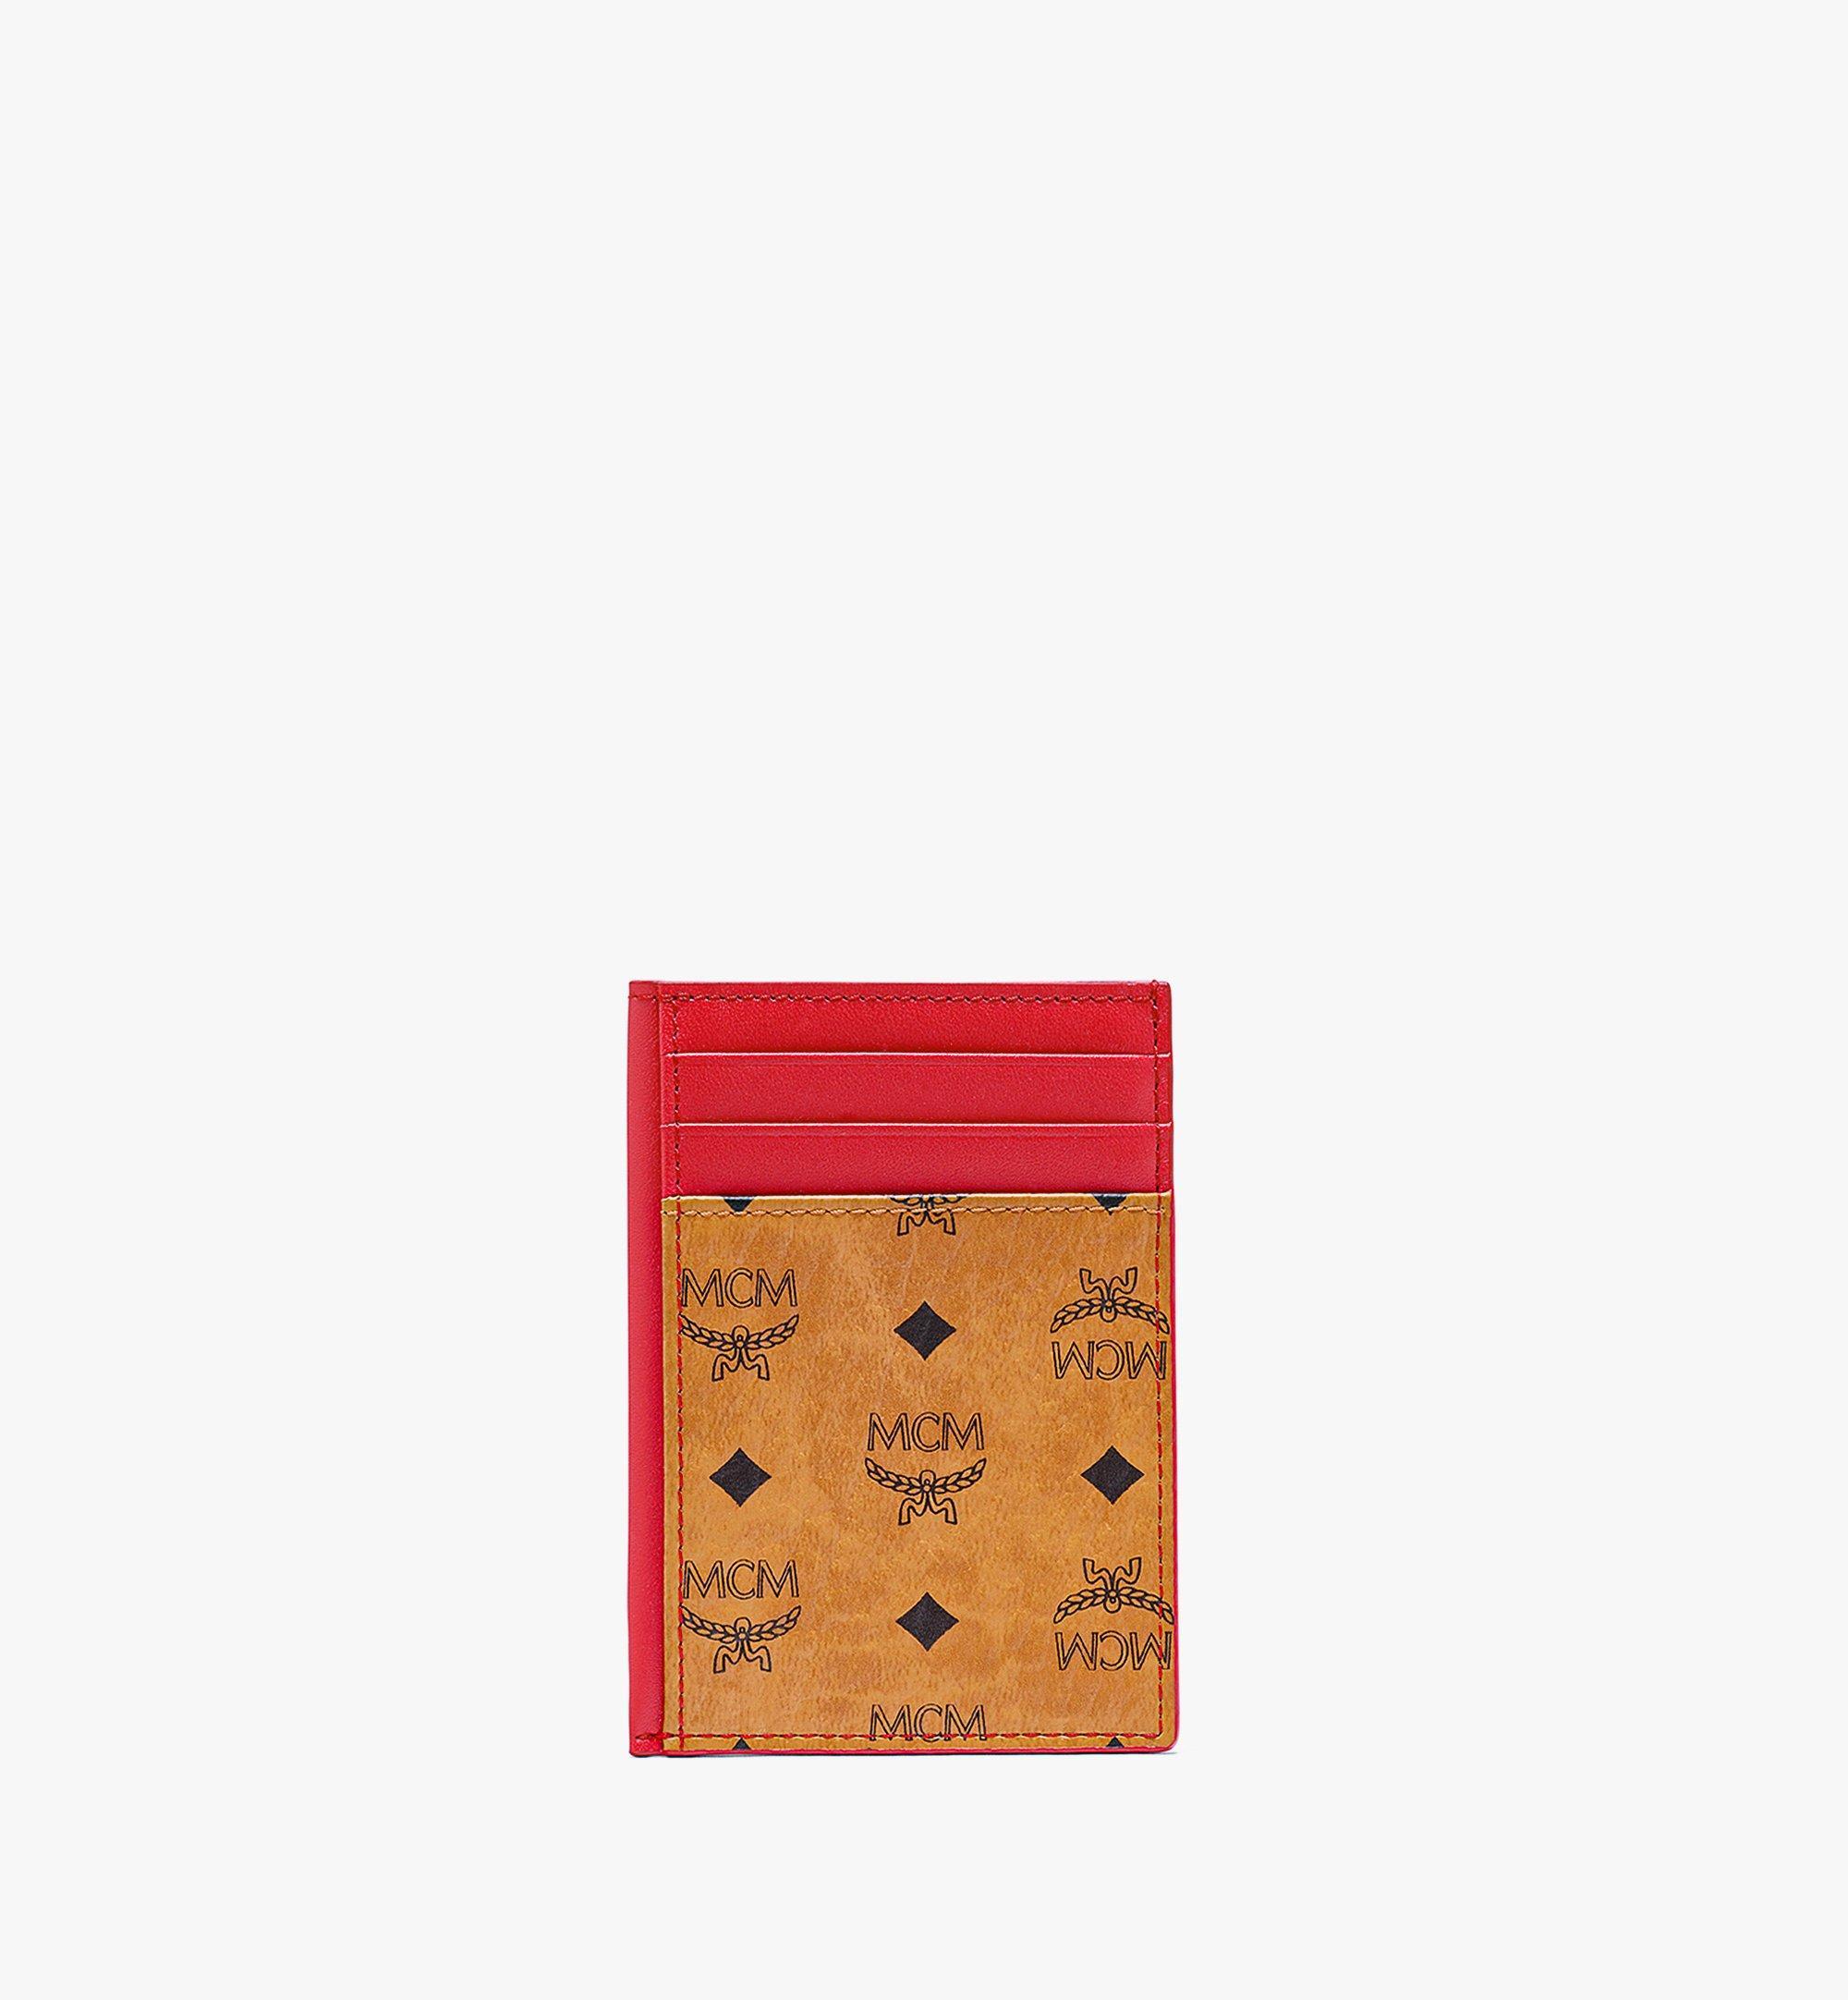 MCM N/S Card Case in Visetos Original Red MXABSVI03R4001 Alternate View 1